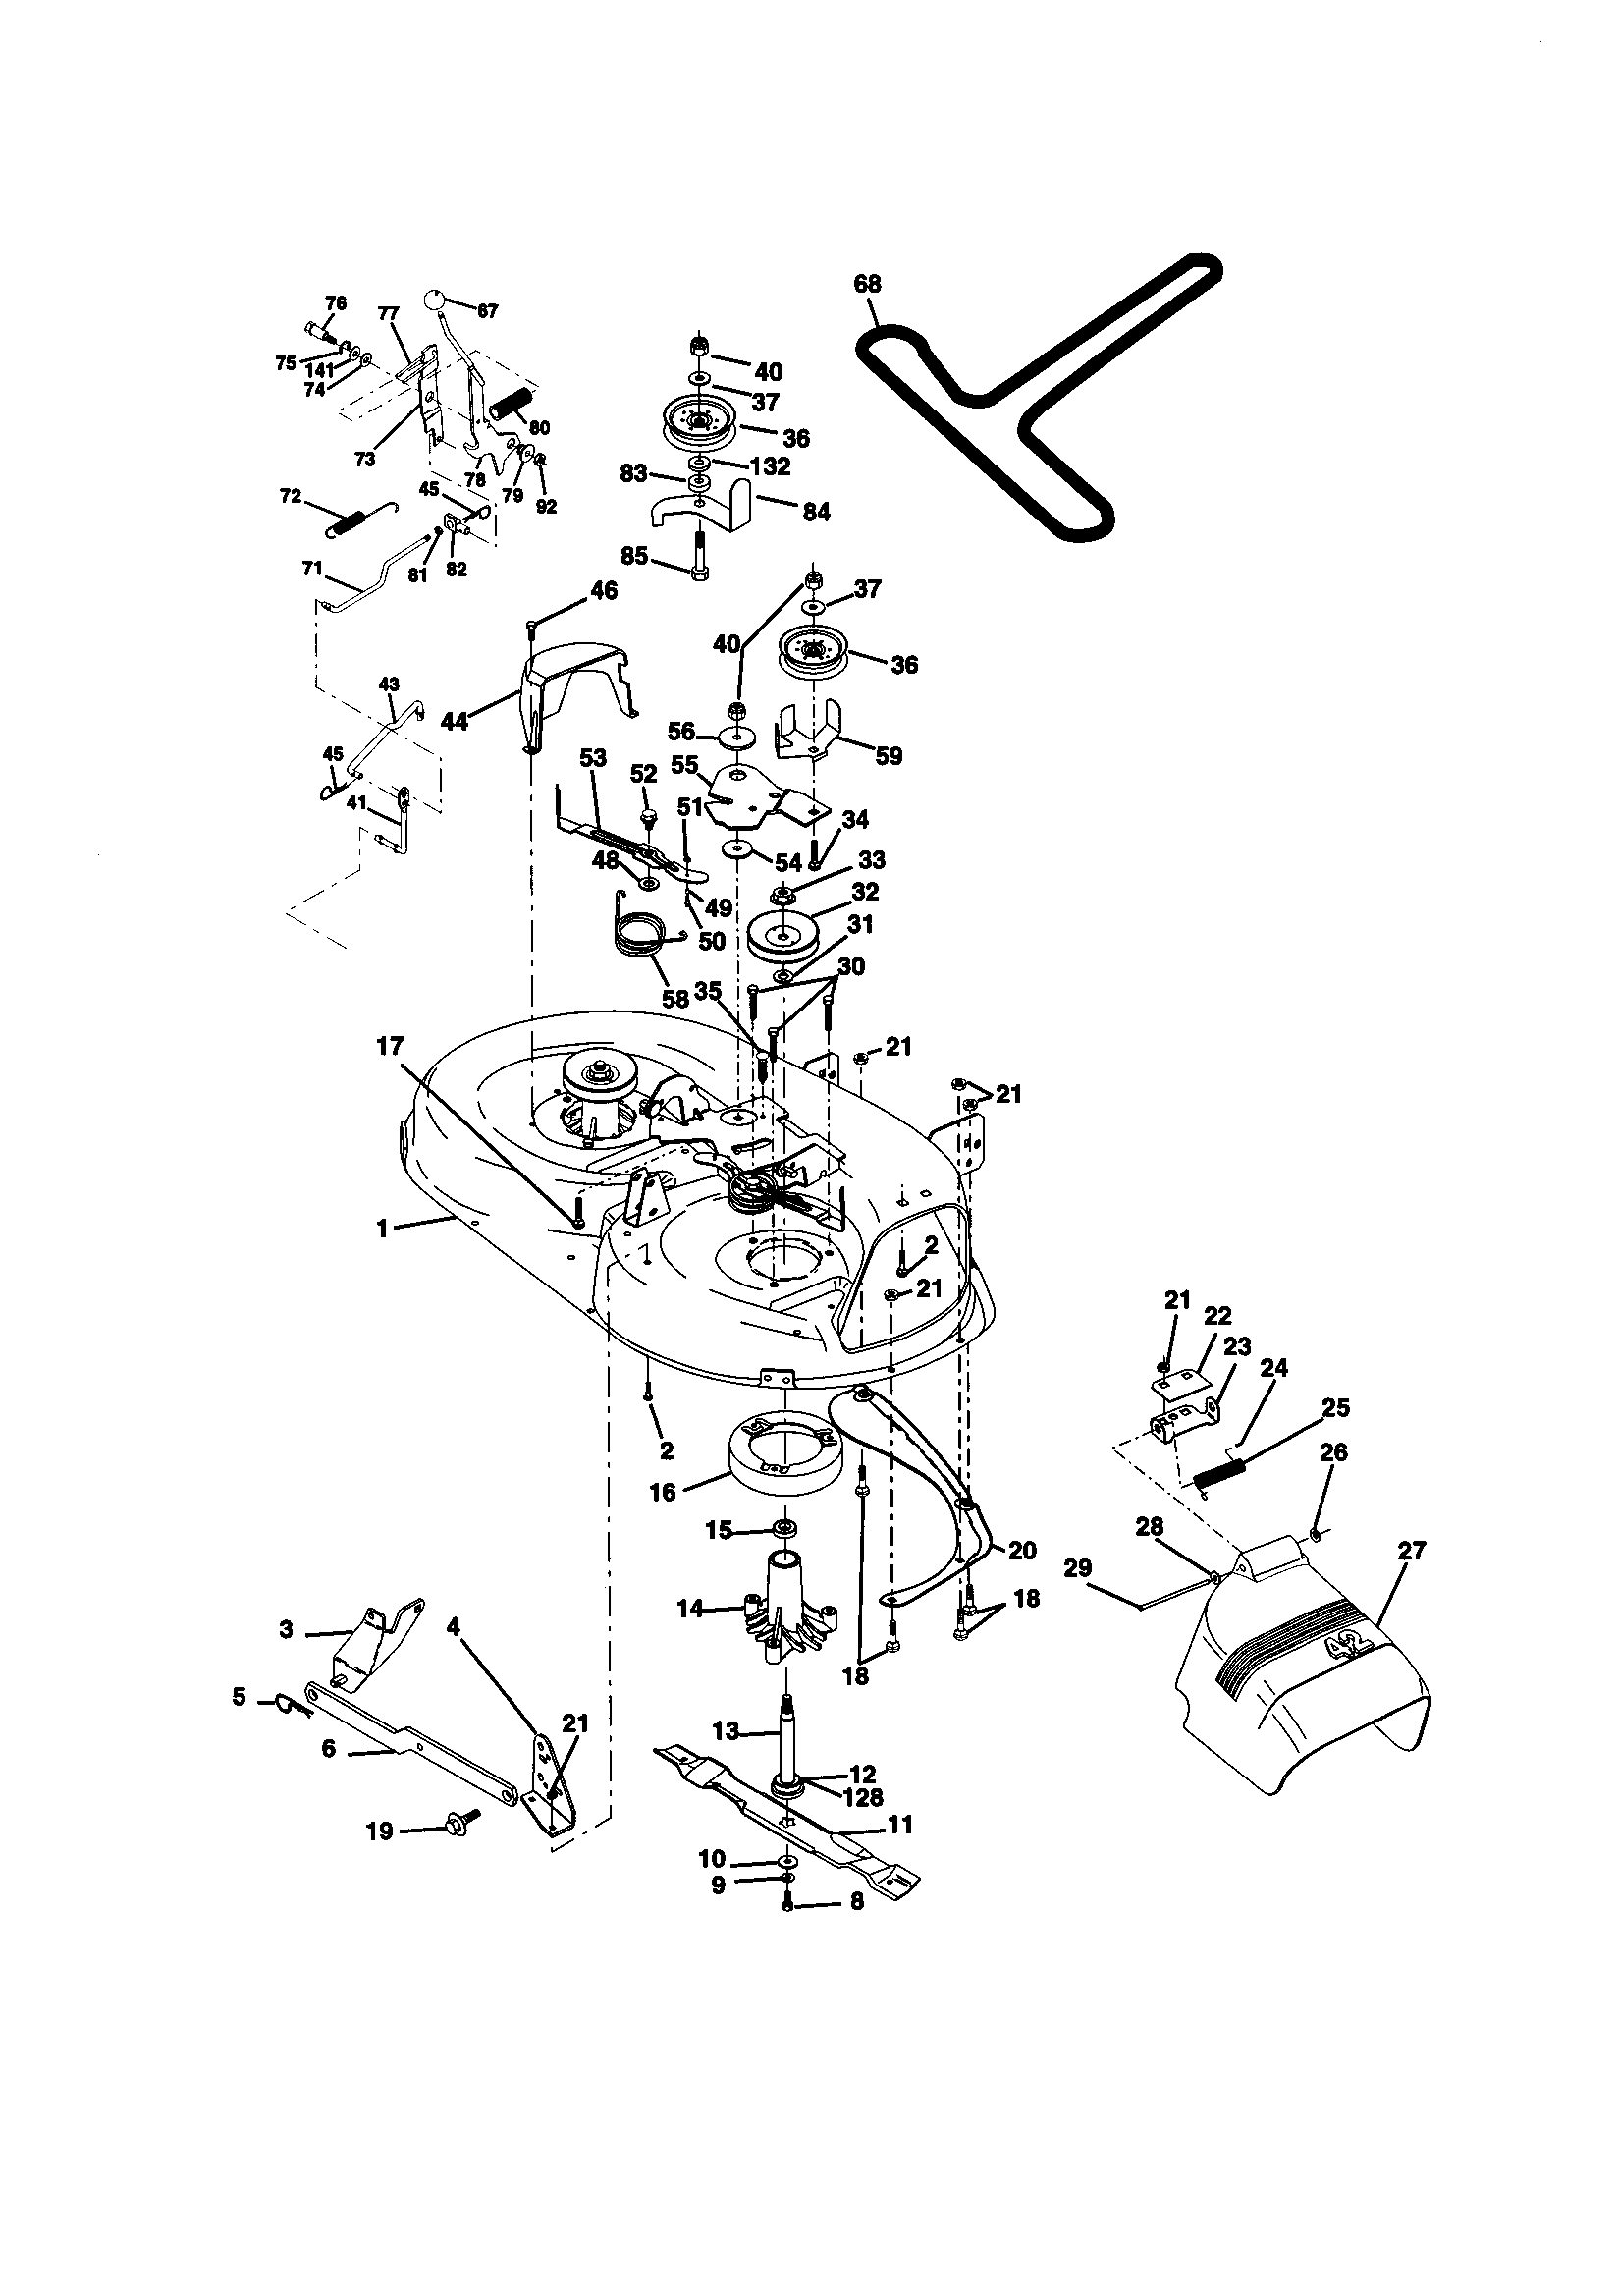 Scotts S1742 Parts Diagram